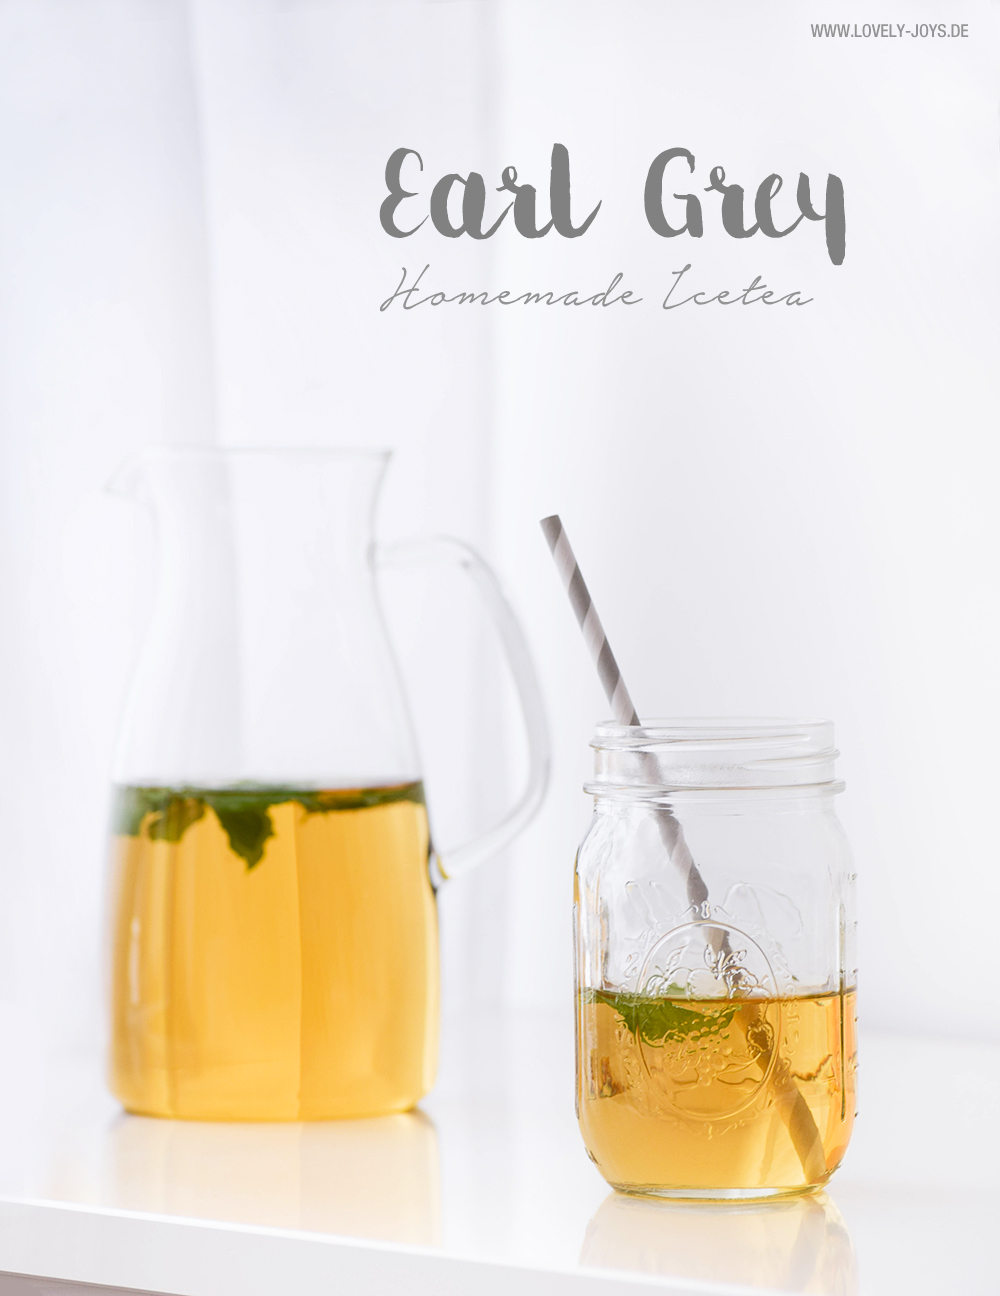 Rezept Eistee selber machen Earl Grey Limette Minze Holunder